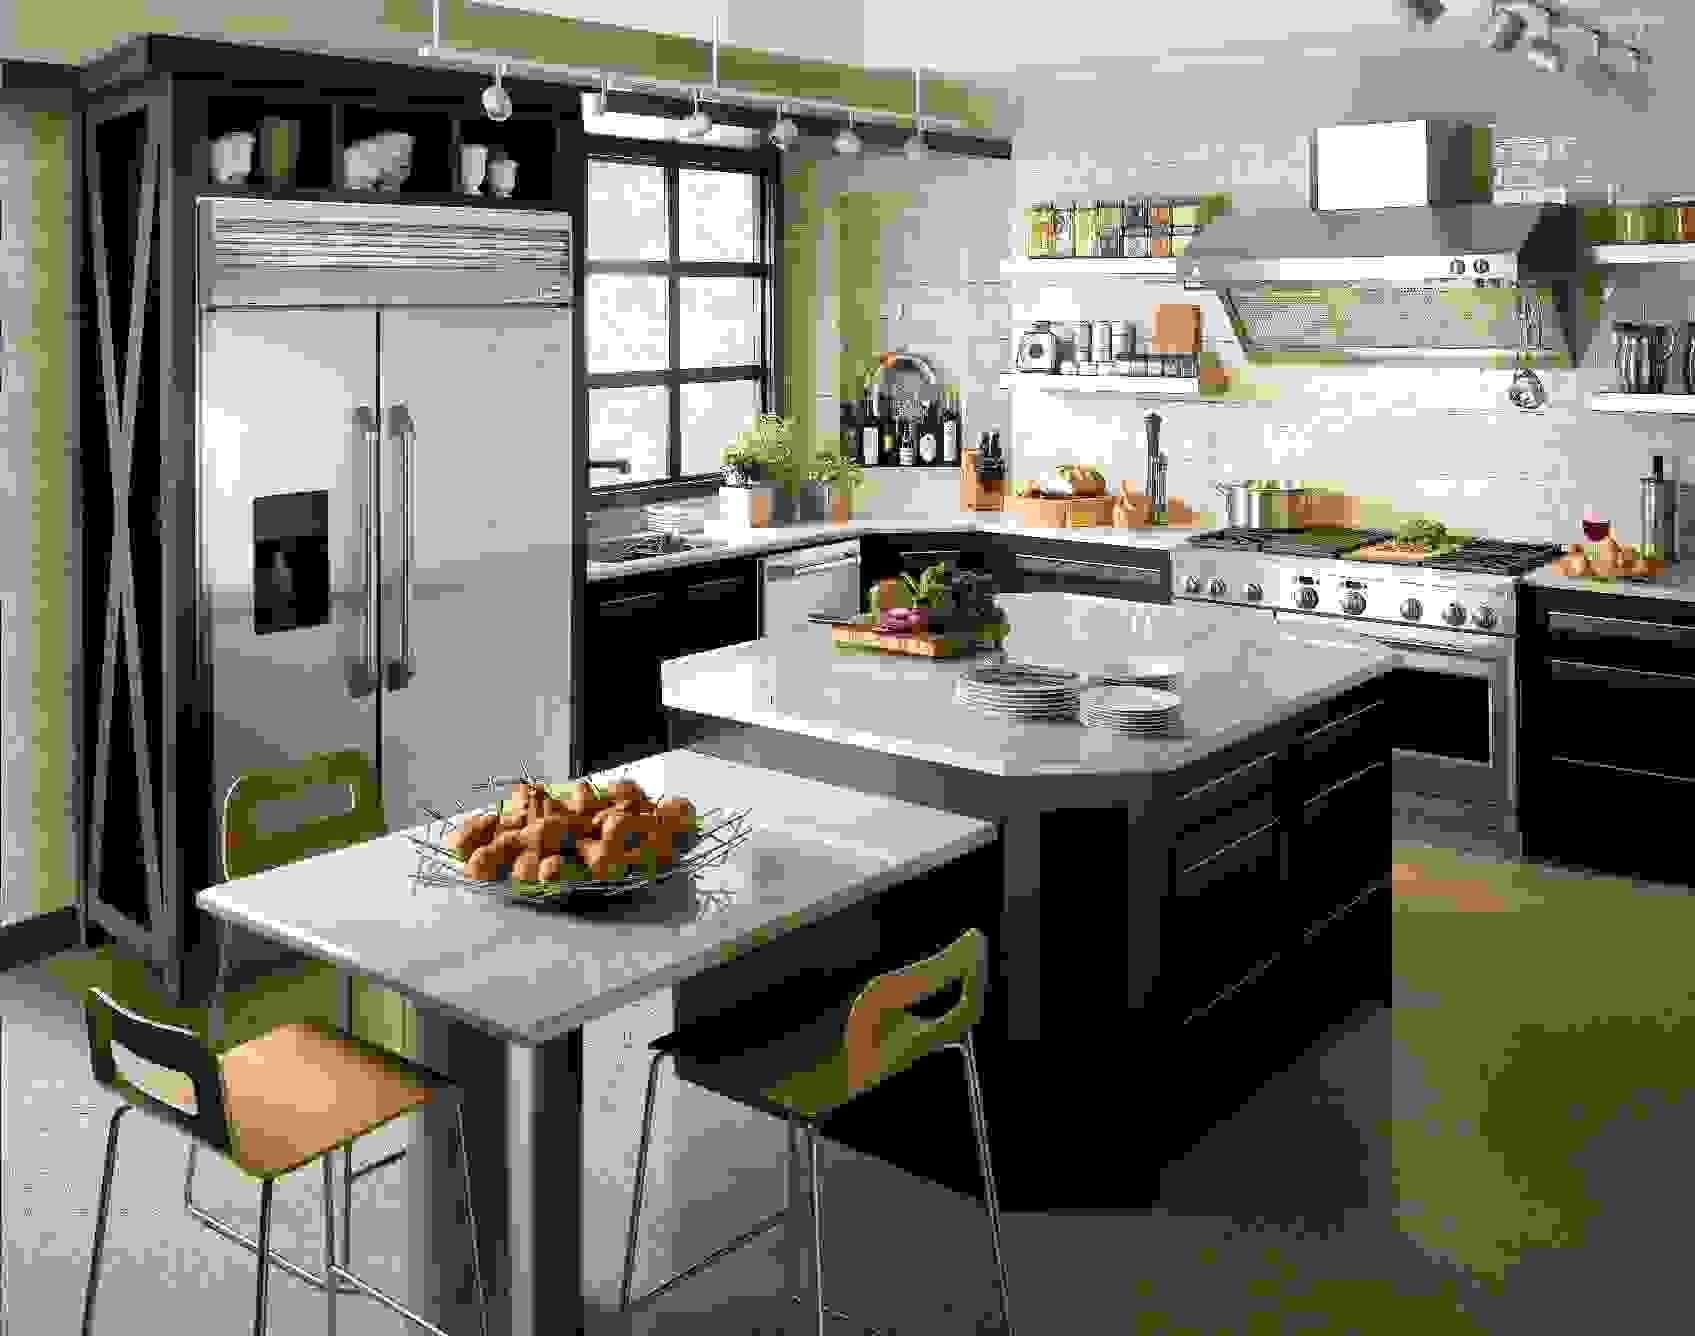 A condo kitchen concept with sleek Monogram appliances.